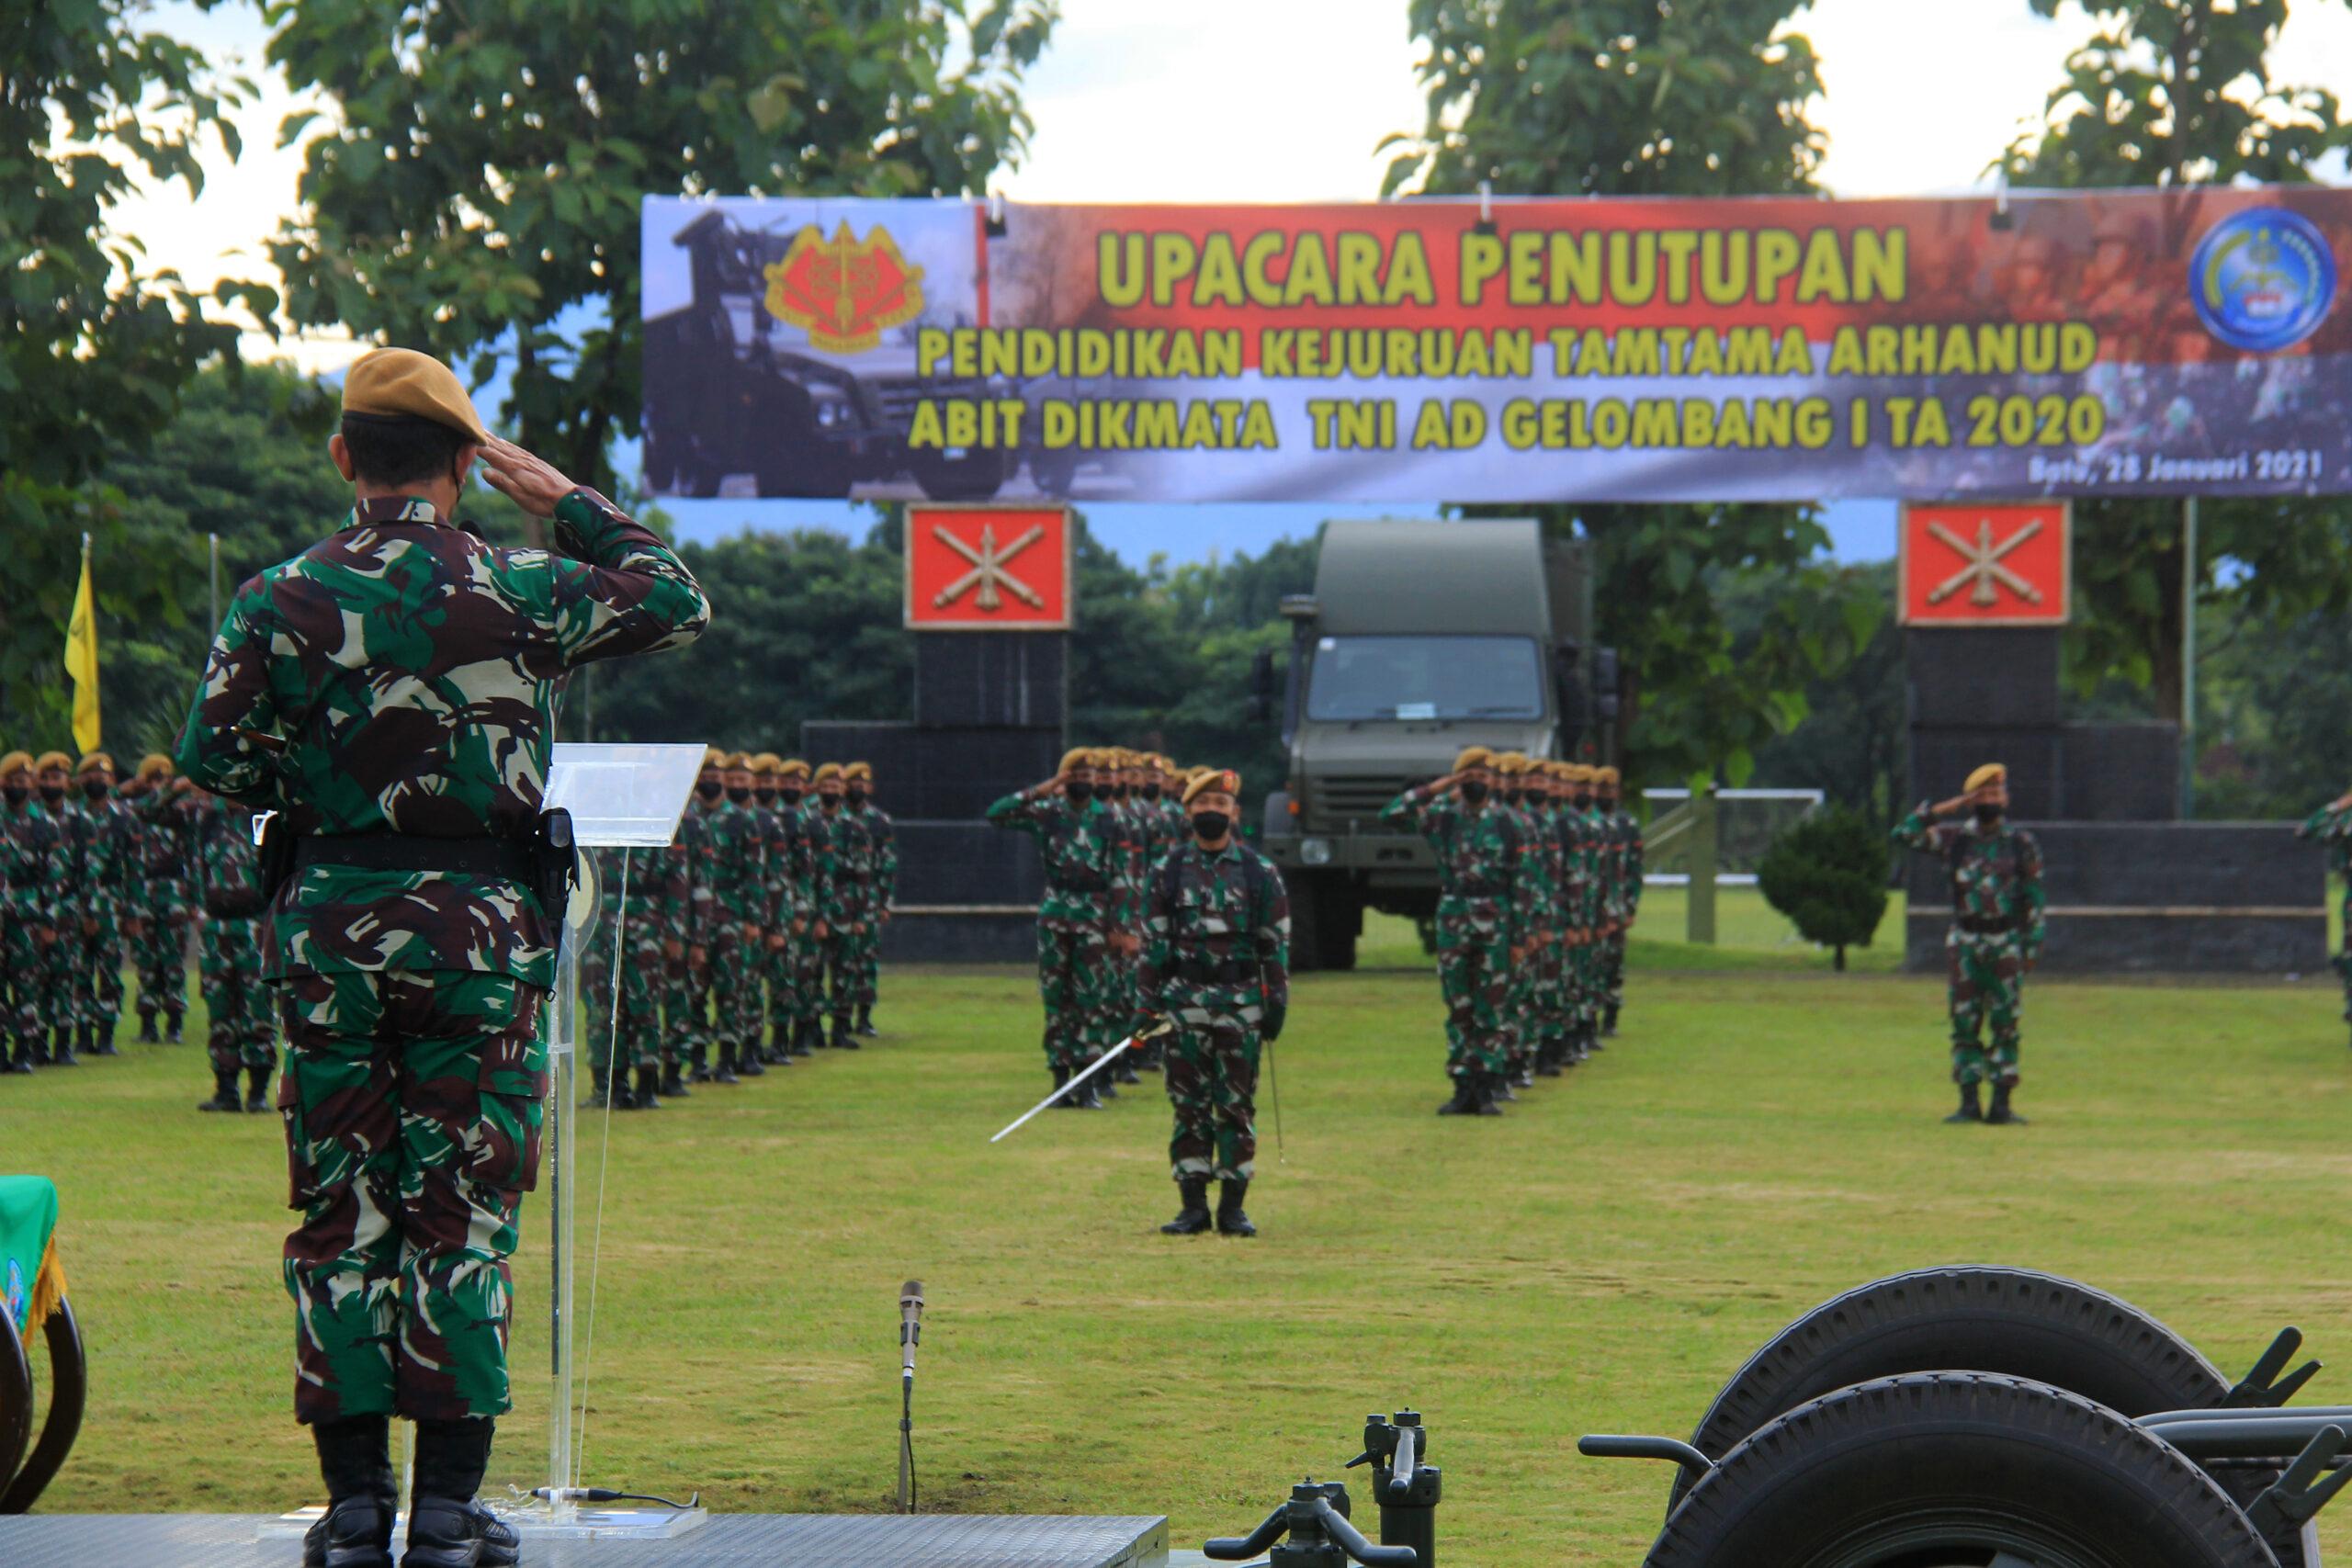 UPACARA PENUTUPAN DIKJURTA ARHANUD ABIT DIKMATA TNI AD GEL I TA 2020